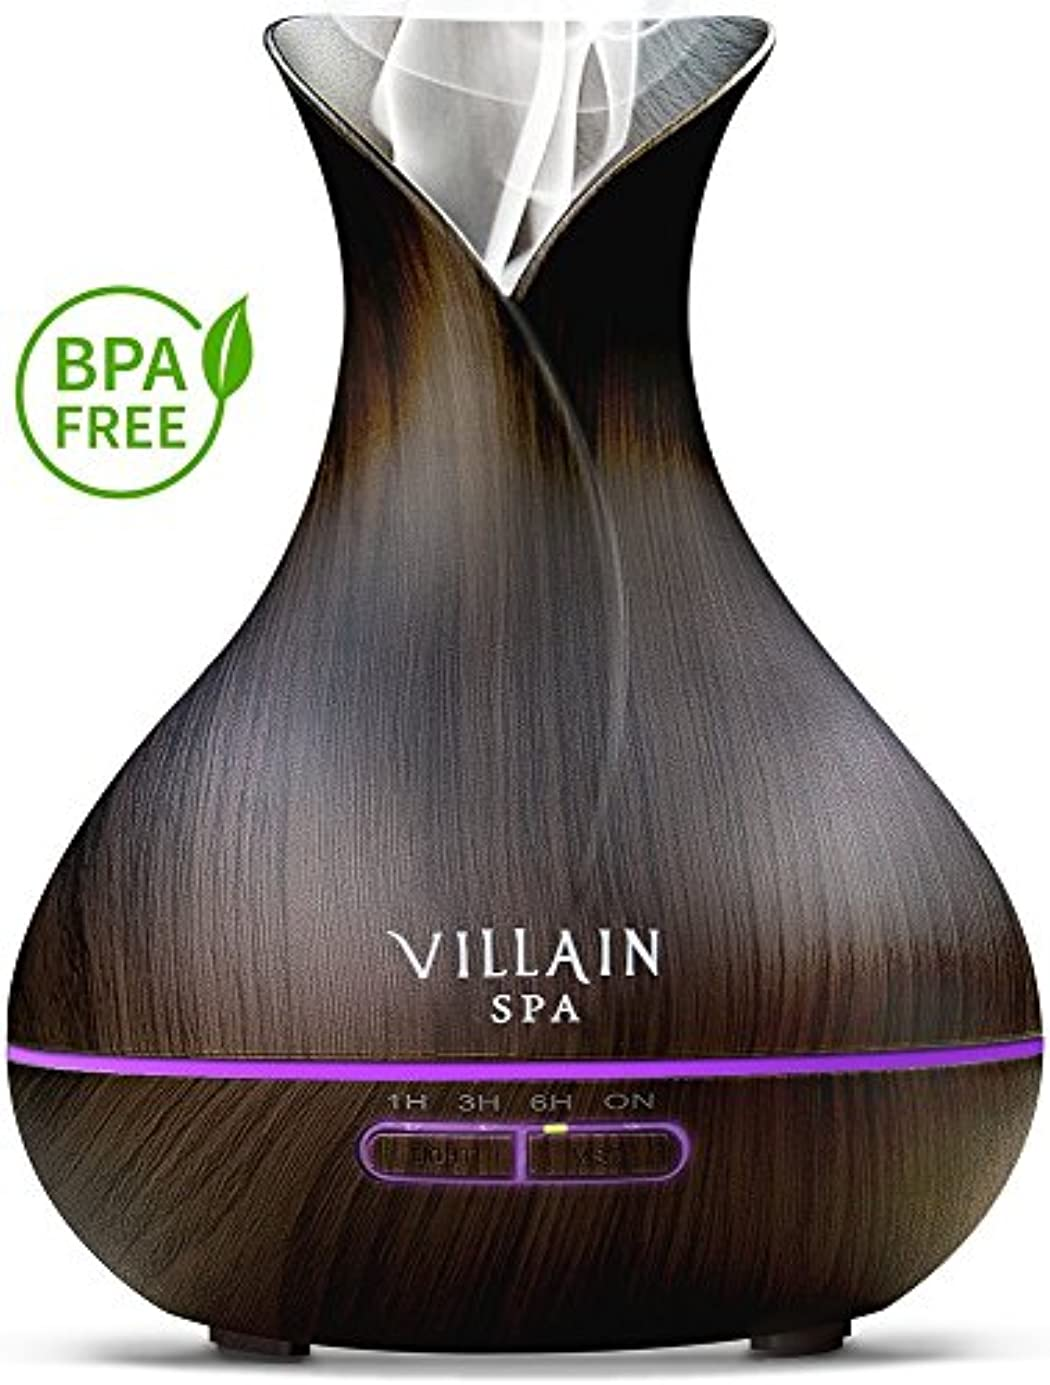 Villain Spa超音波アロマエッセンシャルオイルディフューザー、400 ml木目クールミスト加湿器with 7 LEDライトの色変更、ミストコントロール、自動オフ、8 - 12 HR。ミスト